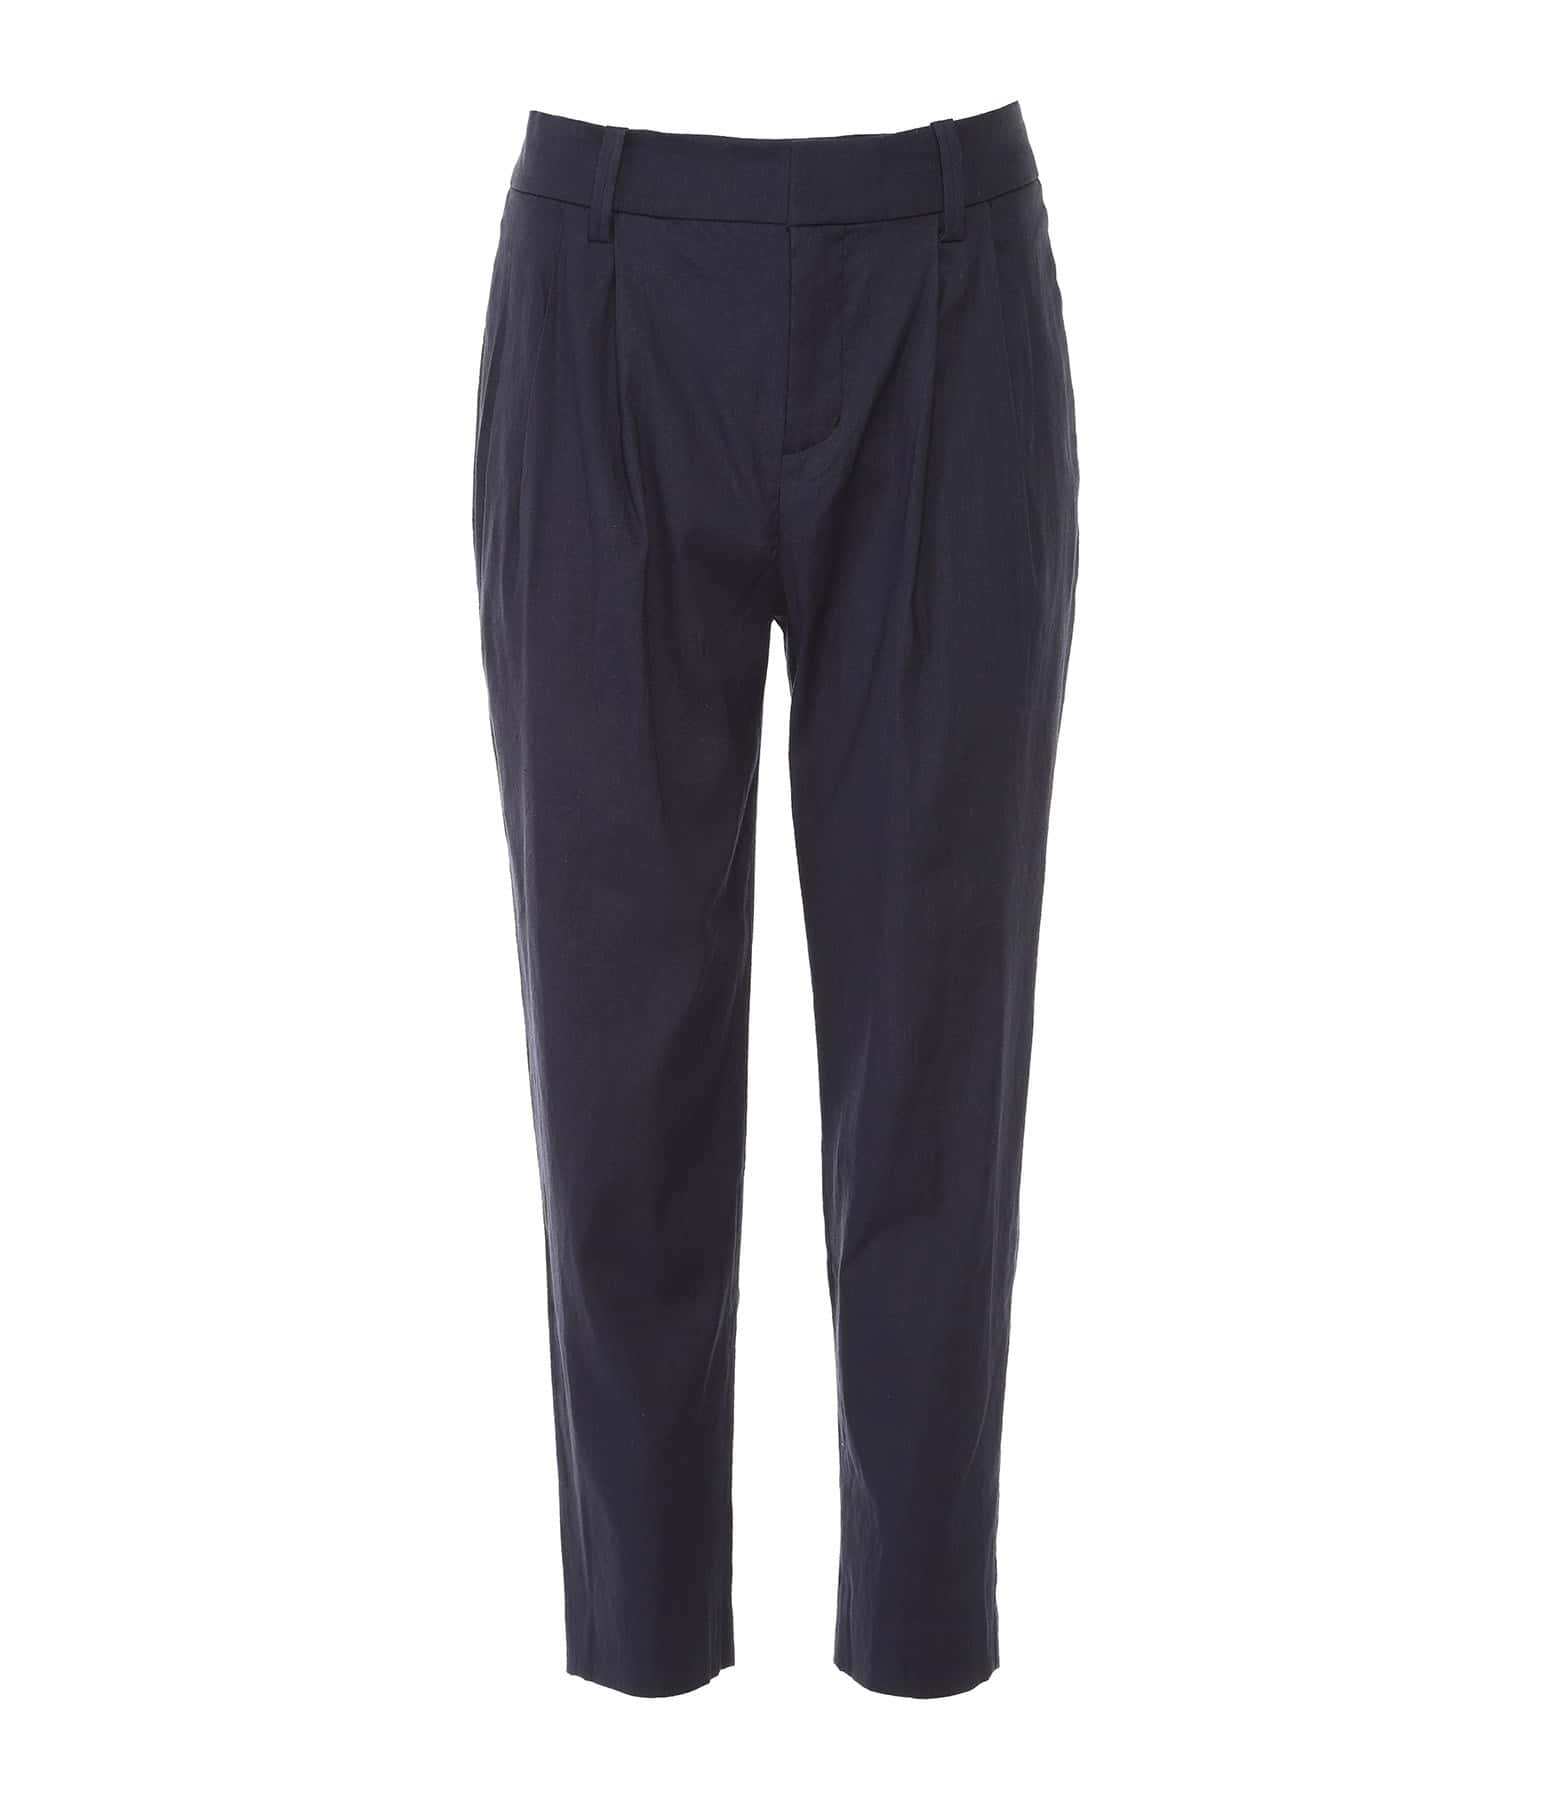 VINCE - Pantalon Taille Haute Bleu Marine